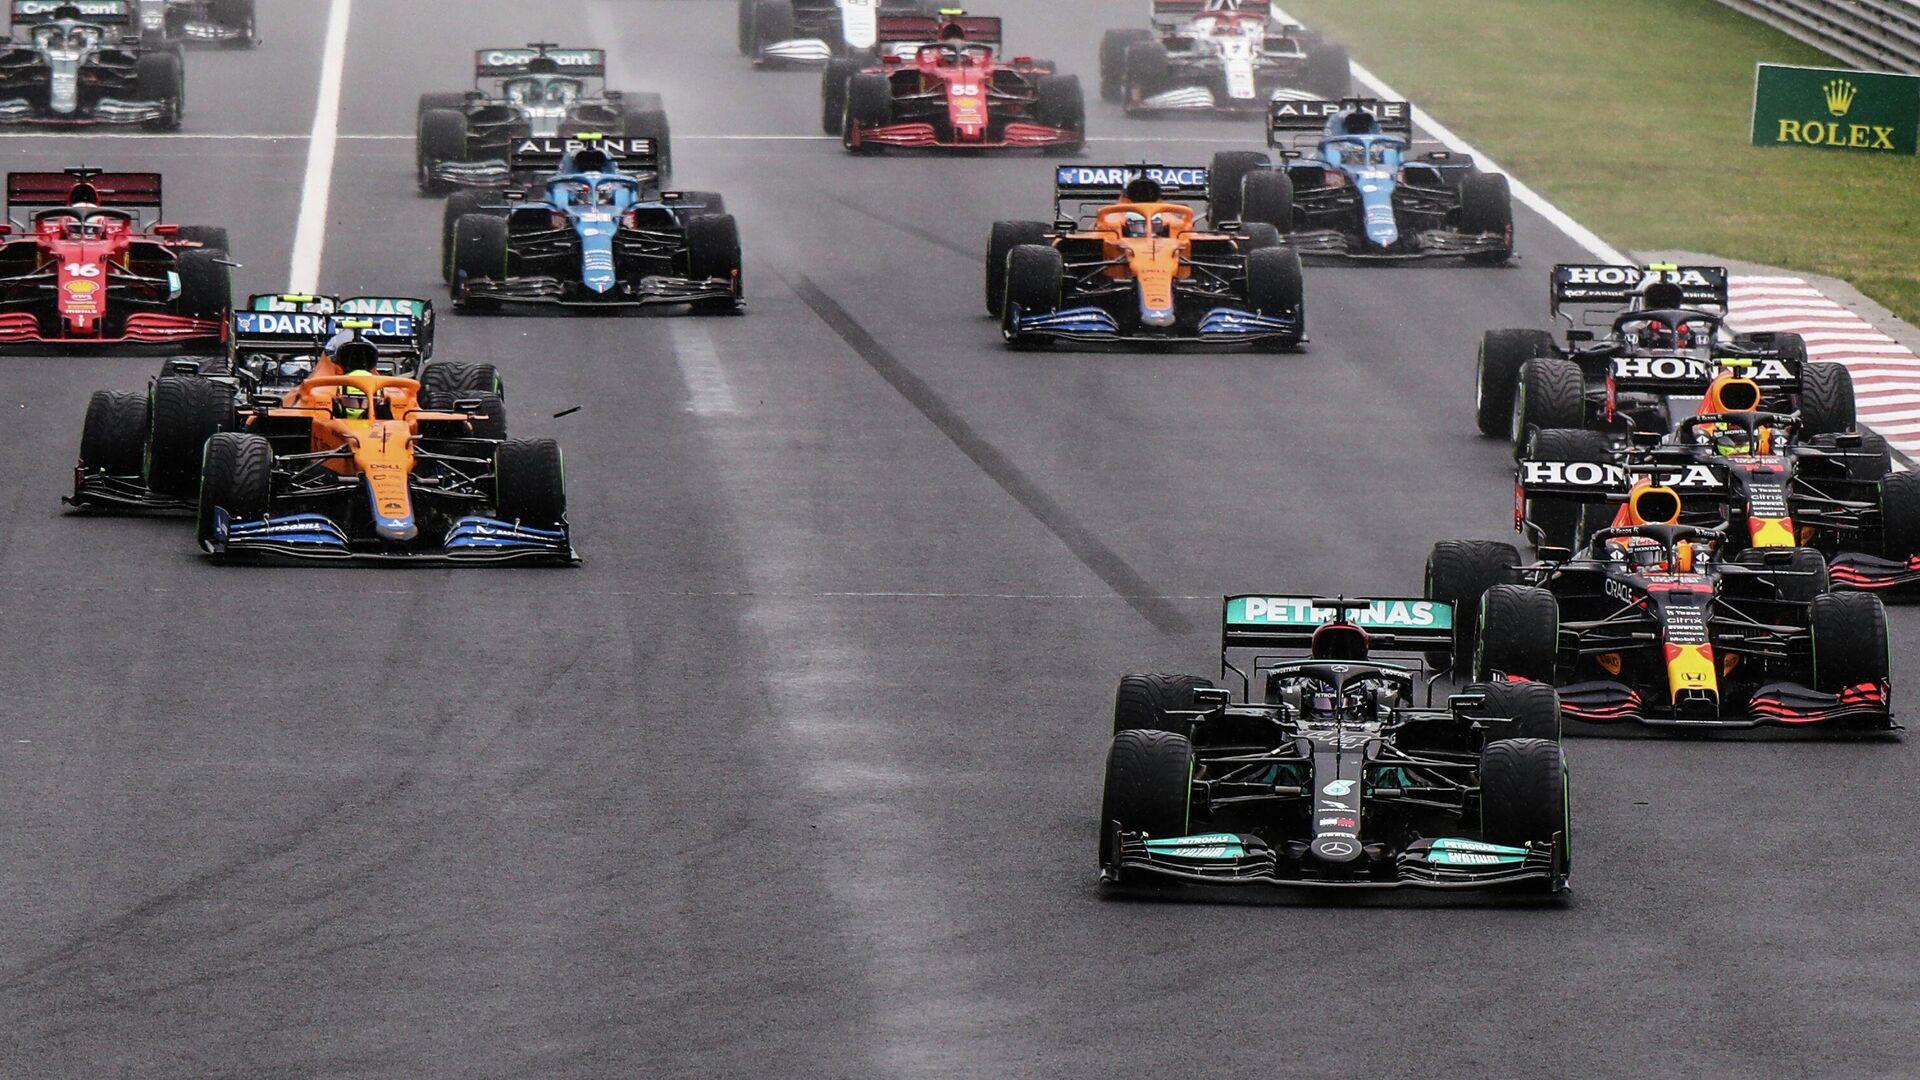 Formula One F1 - Hungarian Grand Prix - Hungaroring, Budapest, Hungary - August 1, 2021 Mercedes' Lewis Hamilton in action as Mercedes' Valtteri Bottas collides with McLaren's Lando Norris Pool via REUTERS/Peter Kohalmi - РИА Новости, 1920, 01.08.2021